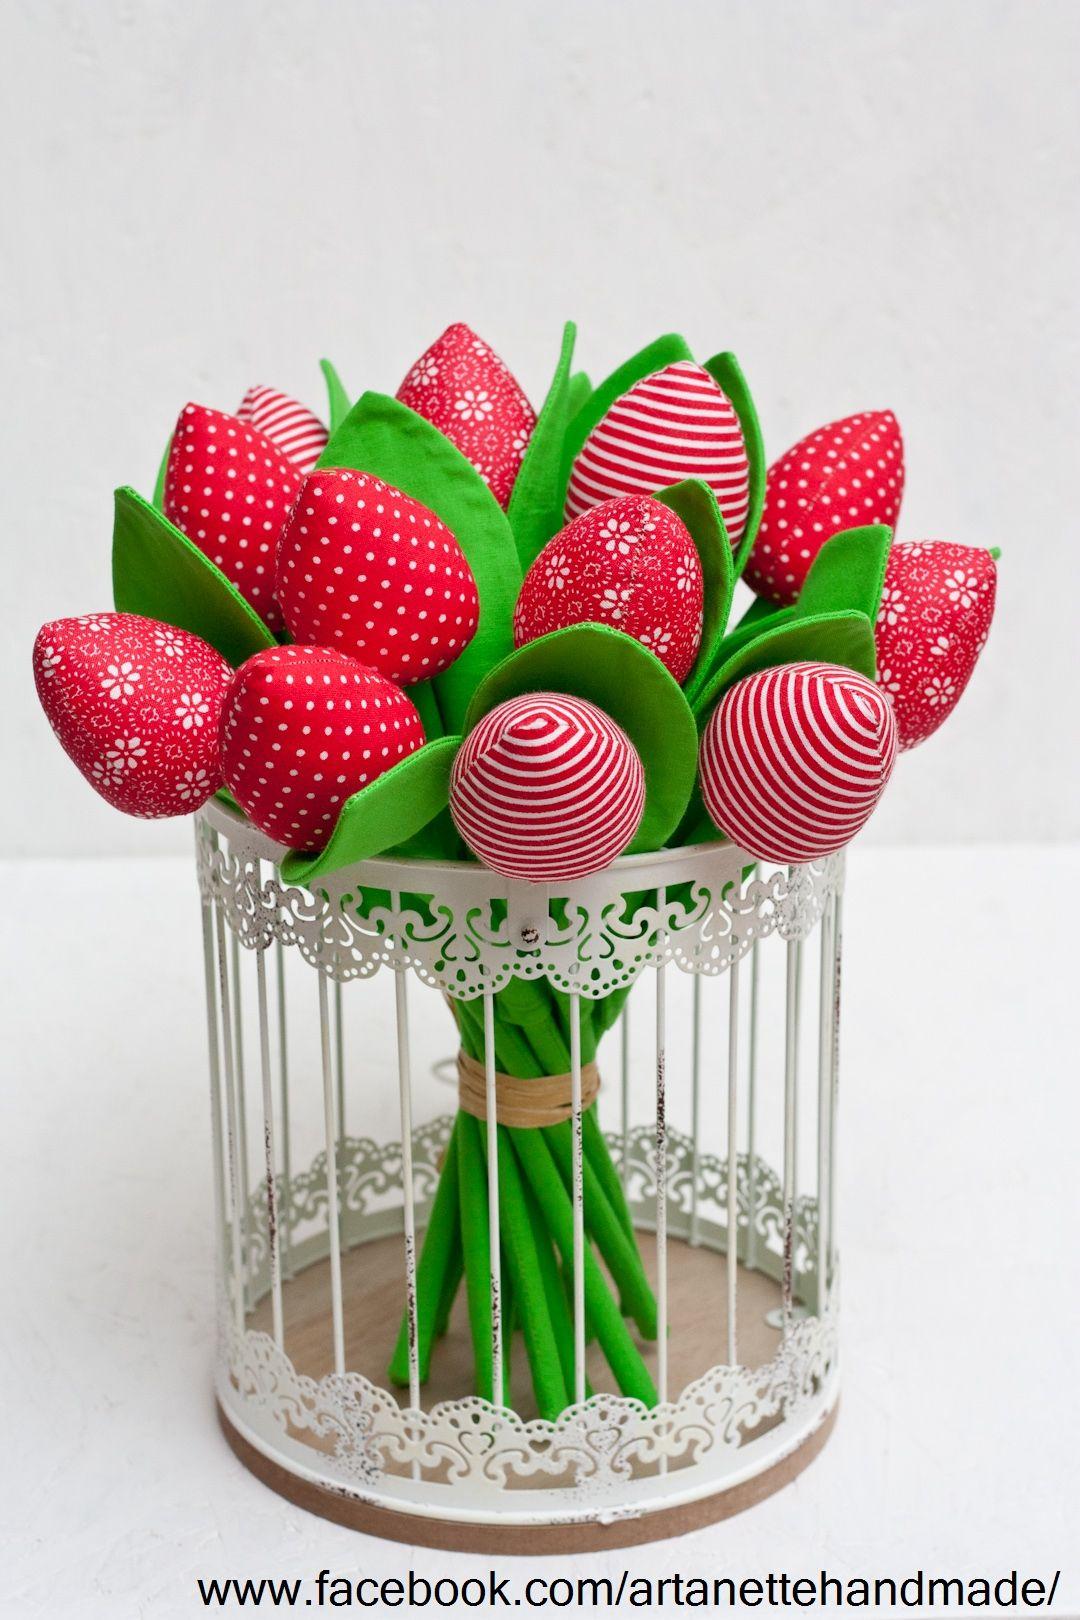 Tulipany Tulipany Z Materialu Kwiaty Z Materialu Bukiet Tulipanow Fabric Flowers Handmade Embroidery Designs Diy And Crafts Crafts